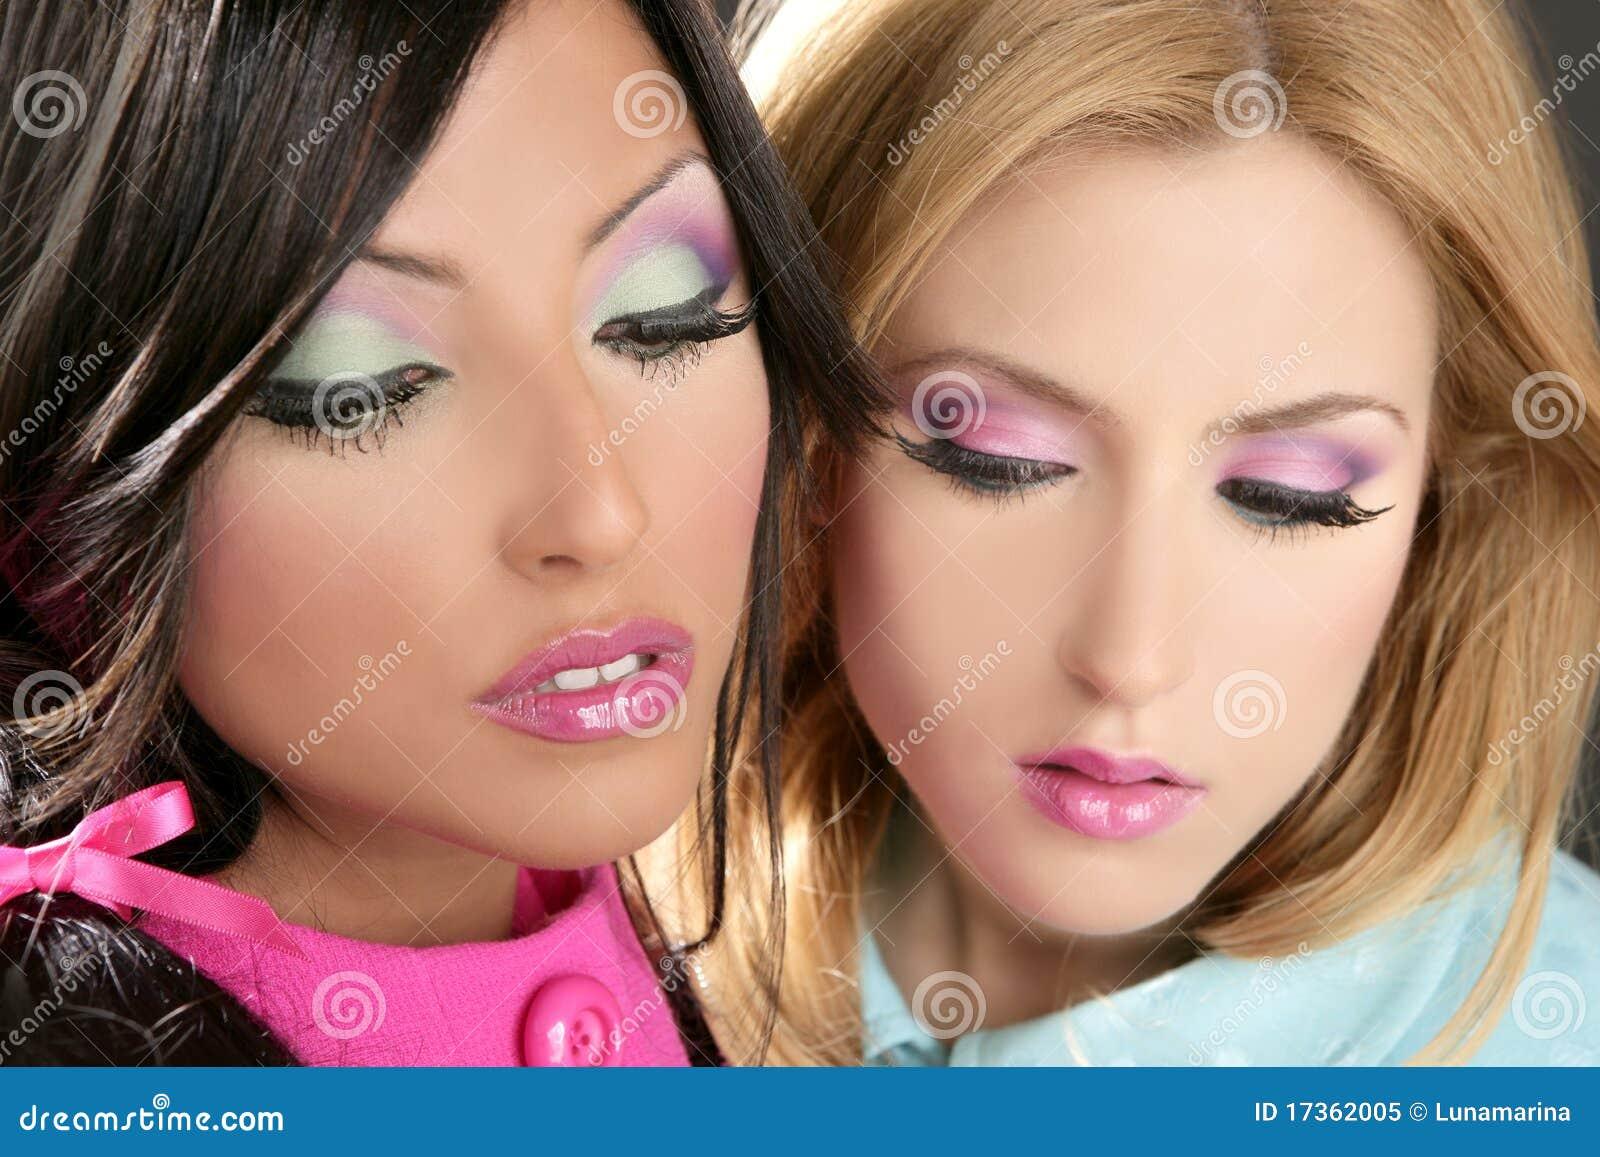 Стиль диско в макияже фото